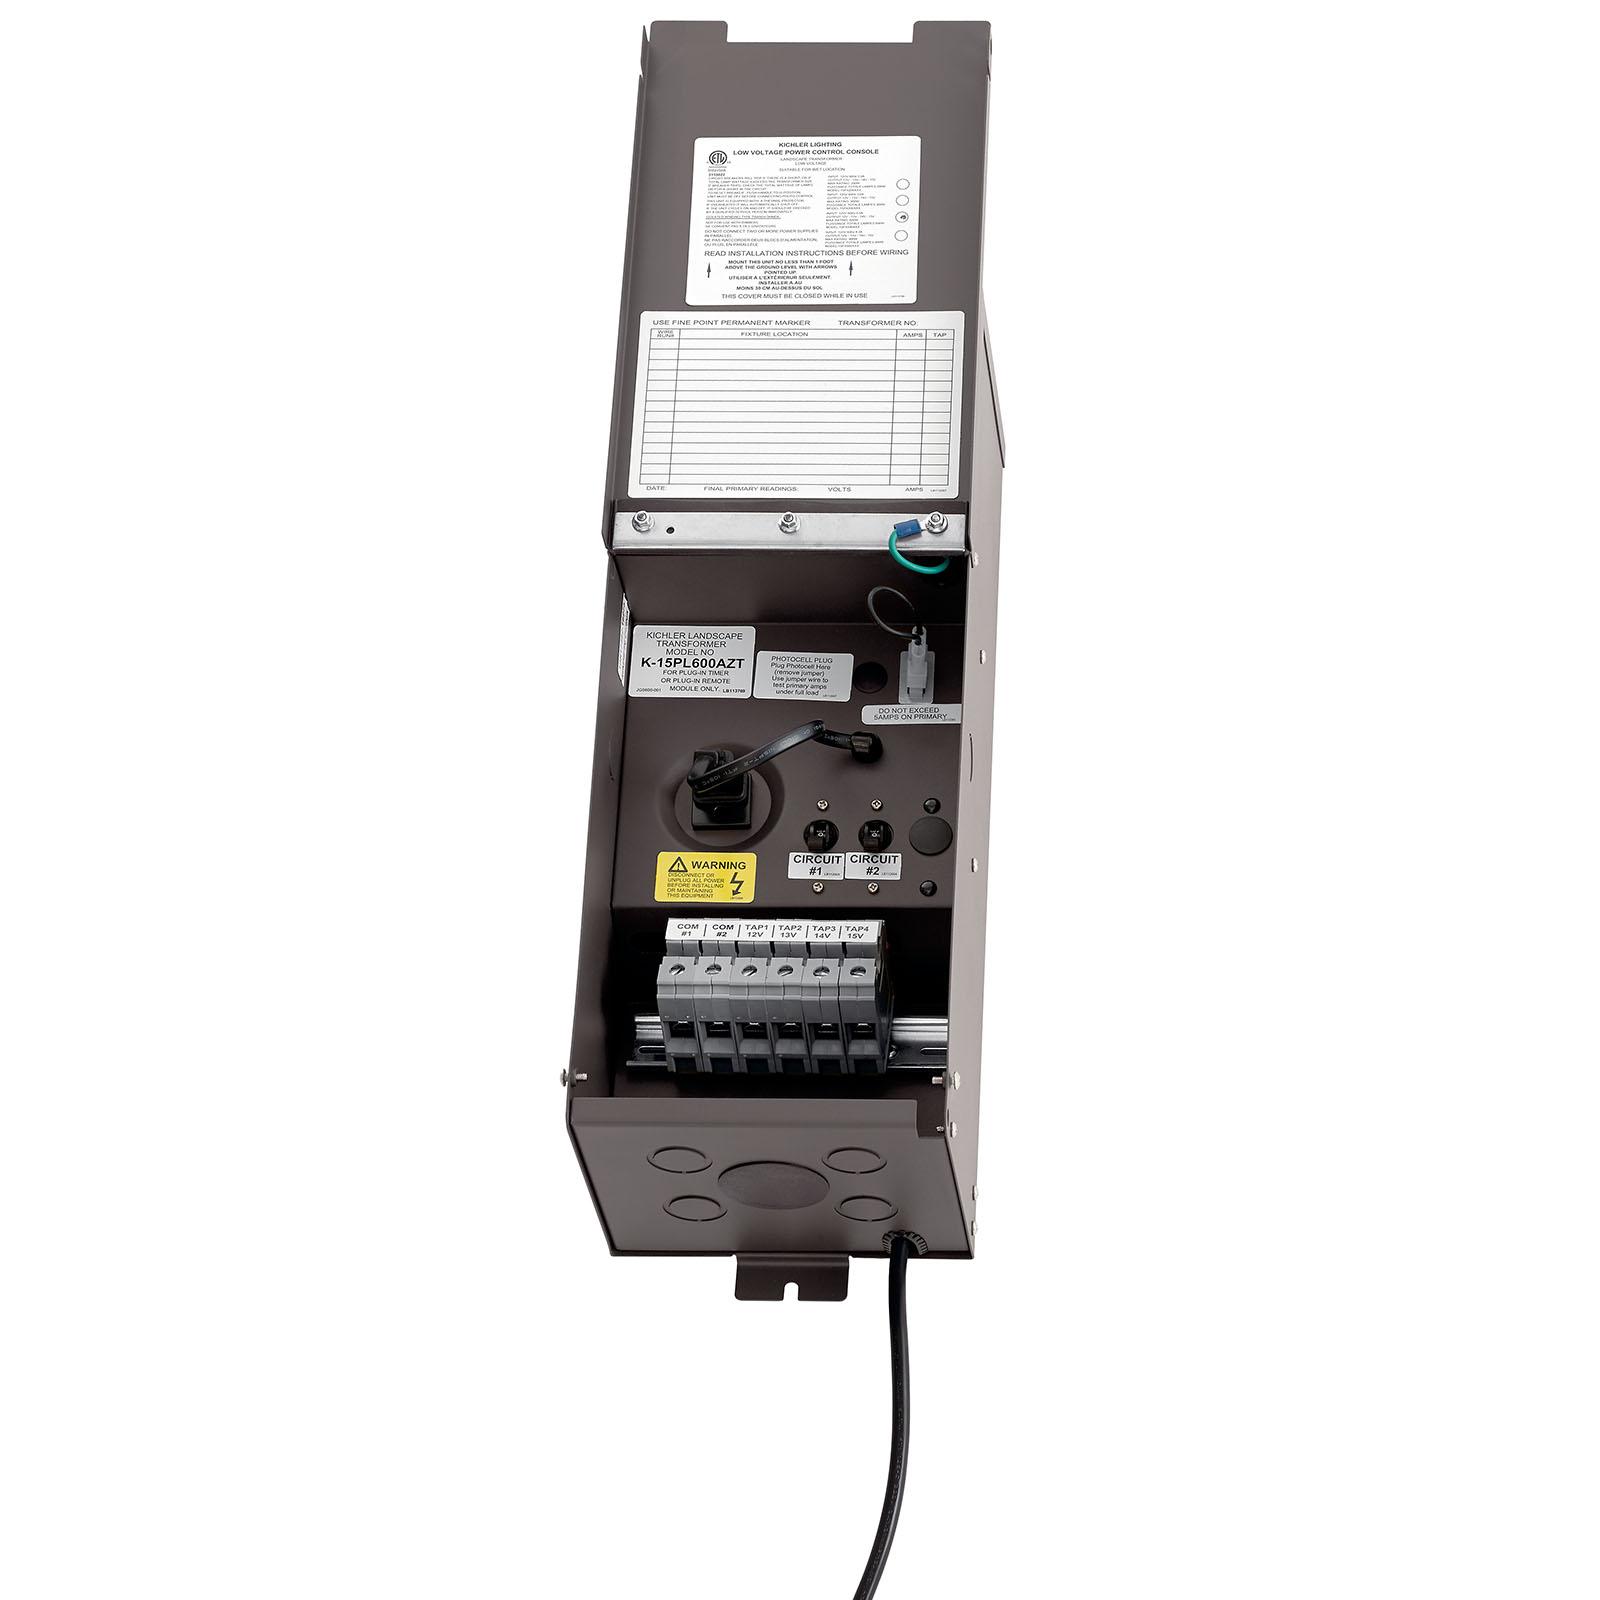 Kichler®15PL600AZT